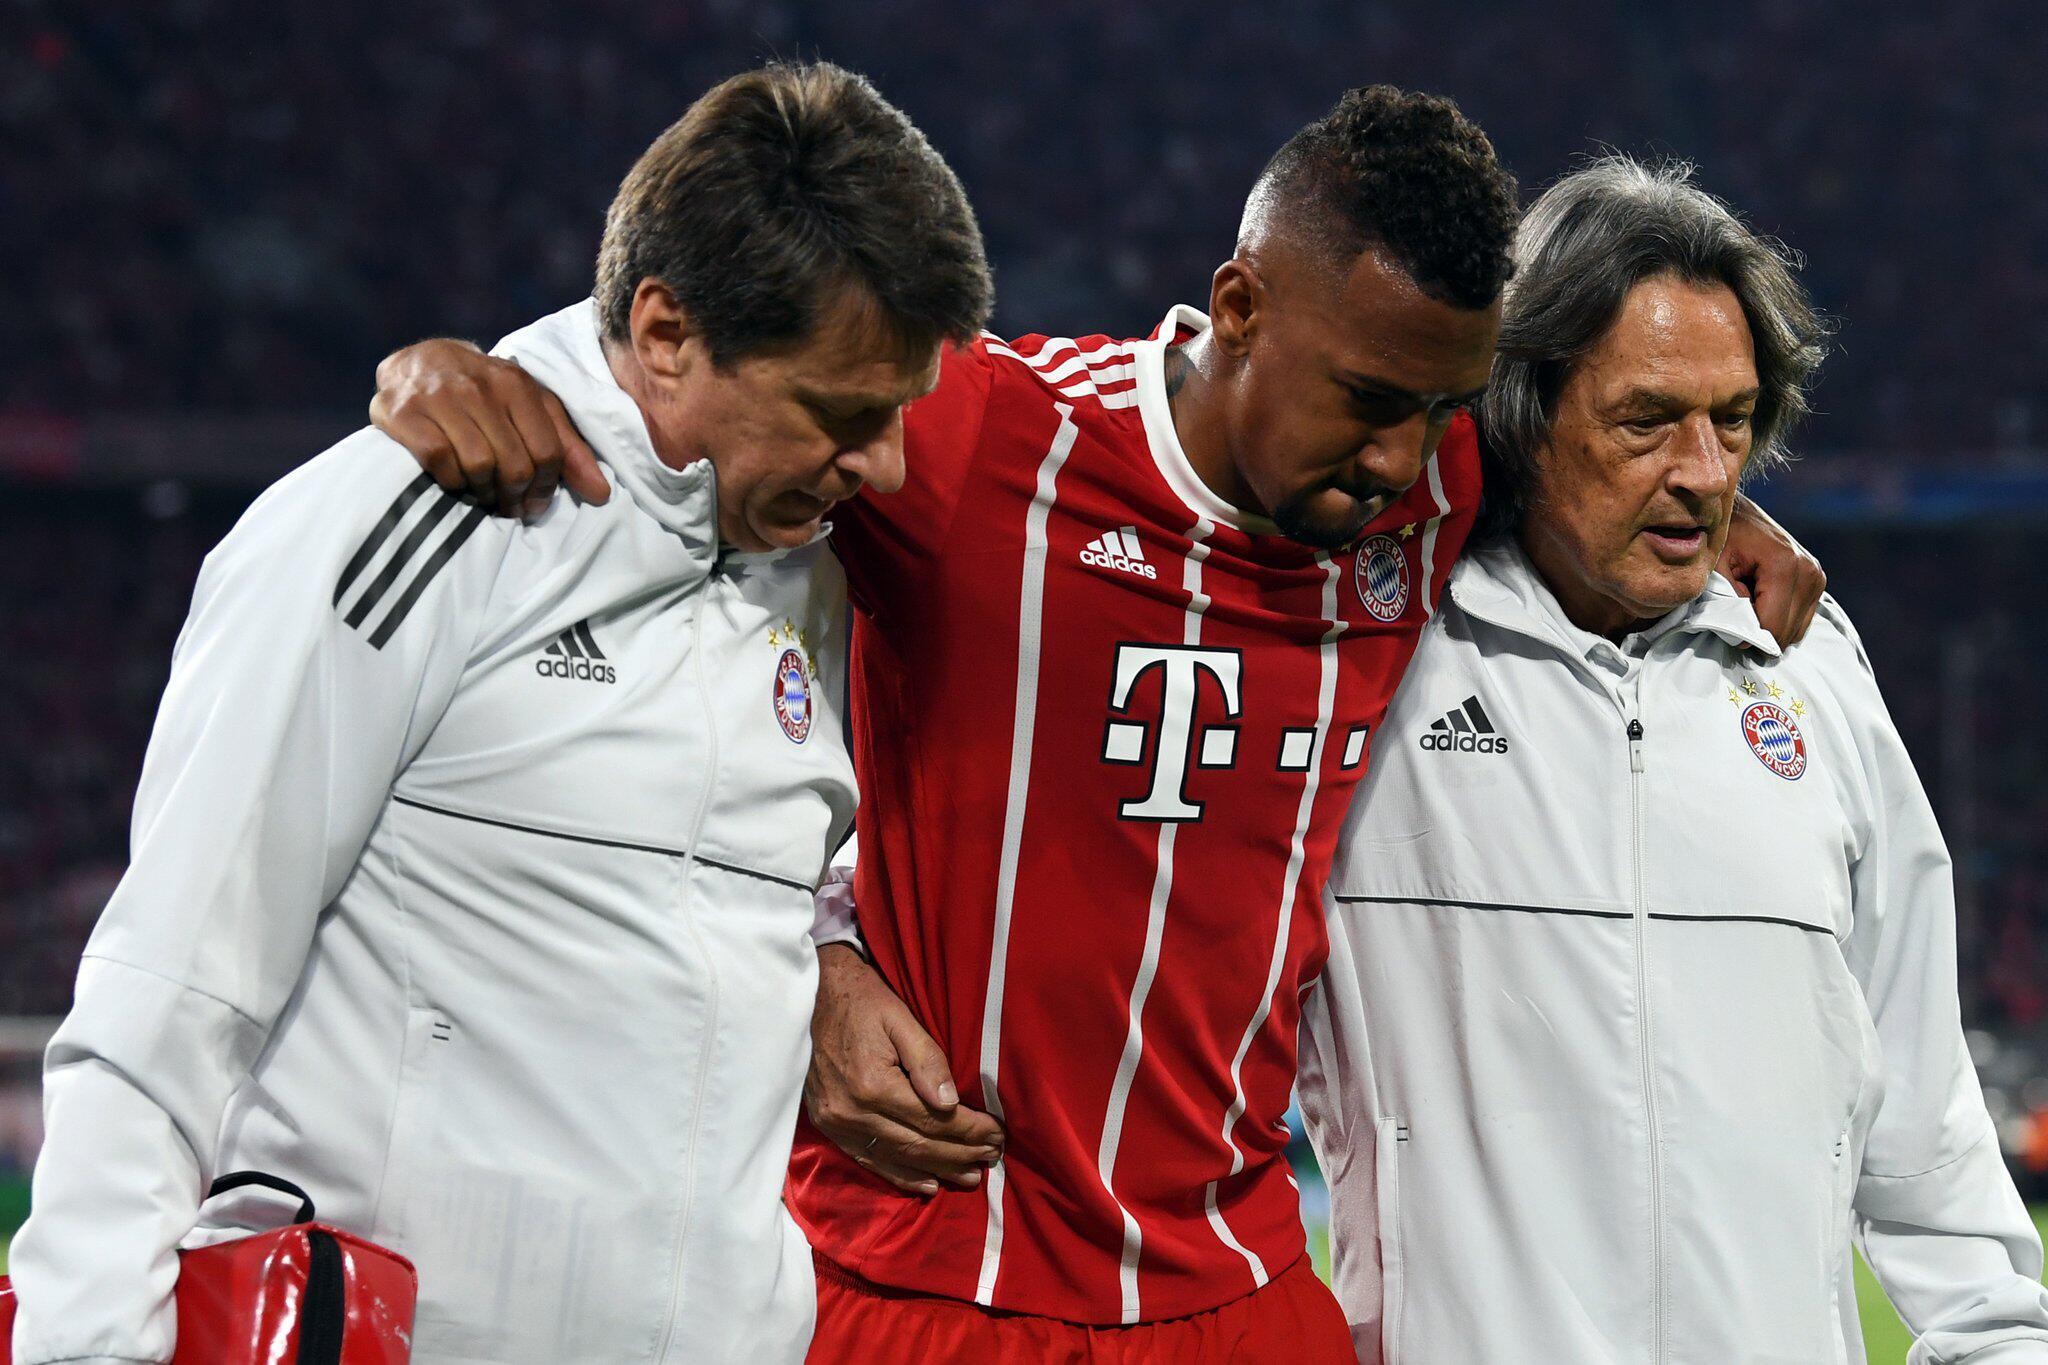 Bild zu Bayern München - Real Madrid, Champions League, Halbfinale, Jerome Boateng, Verletzung